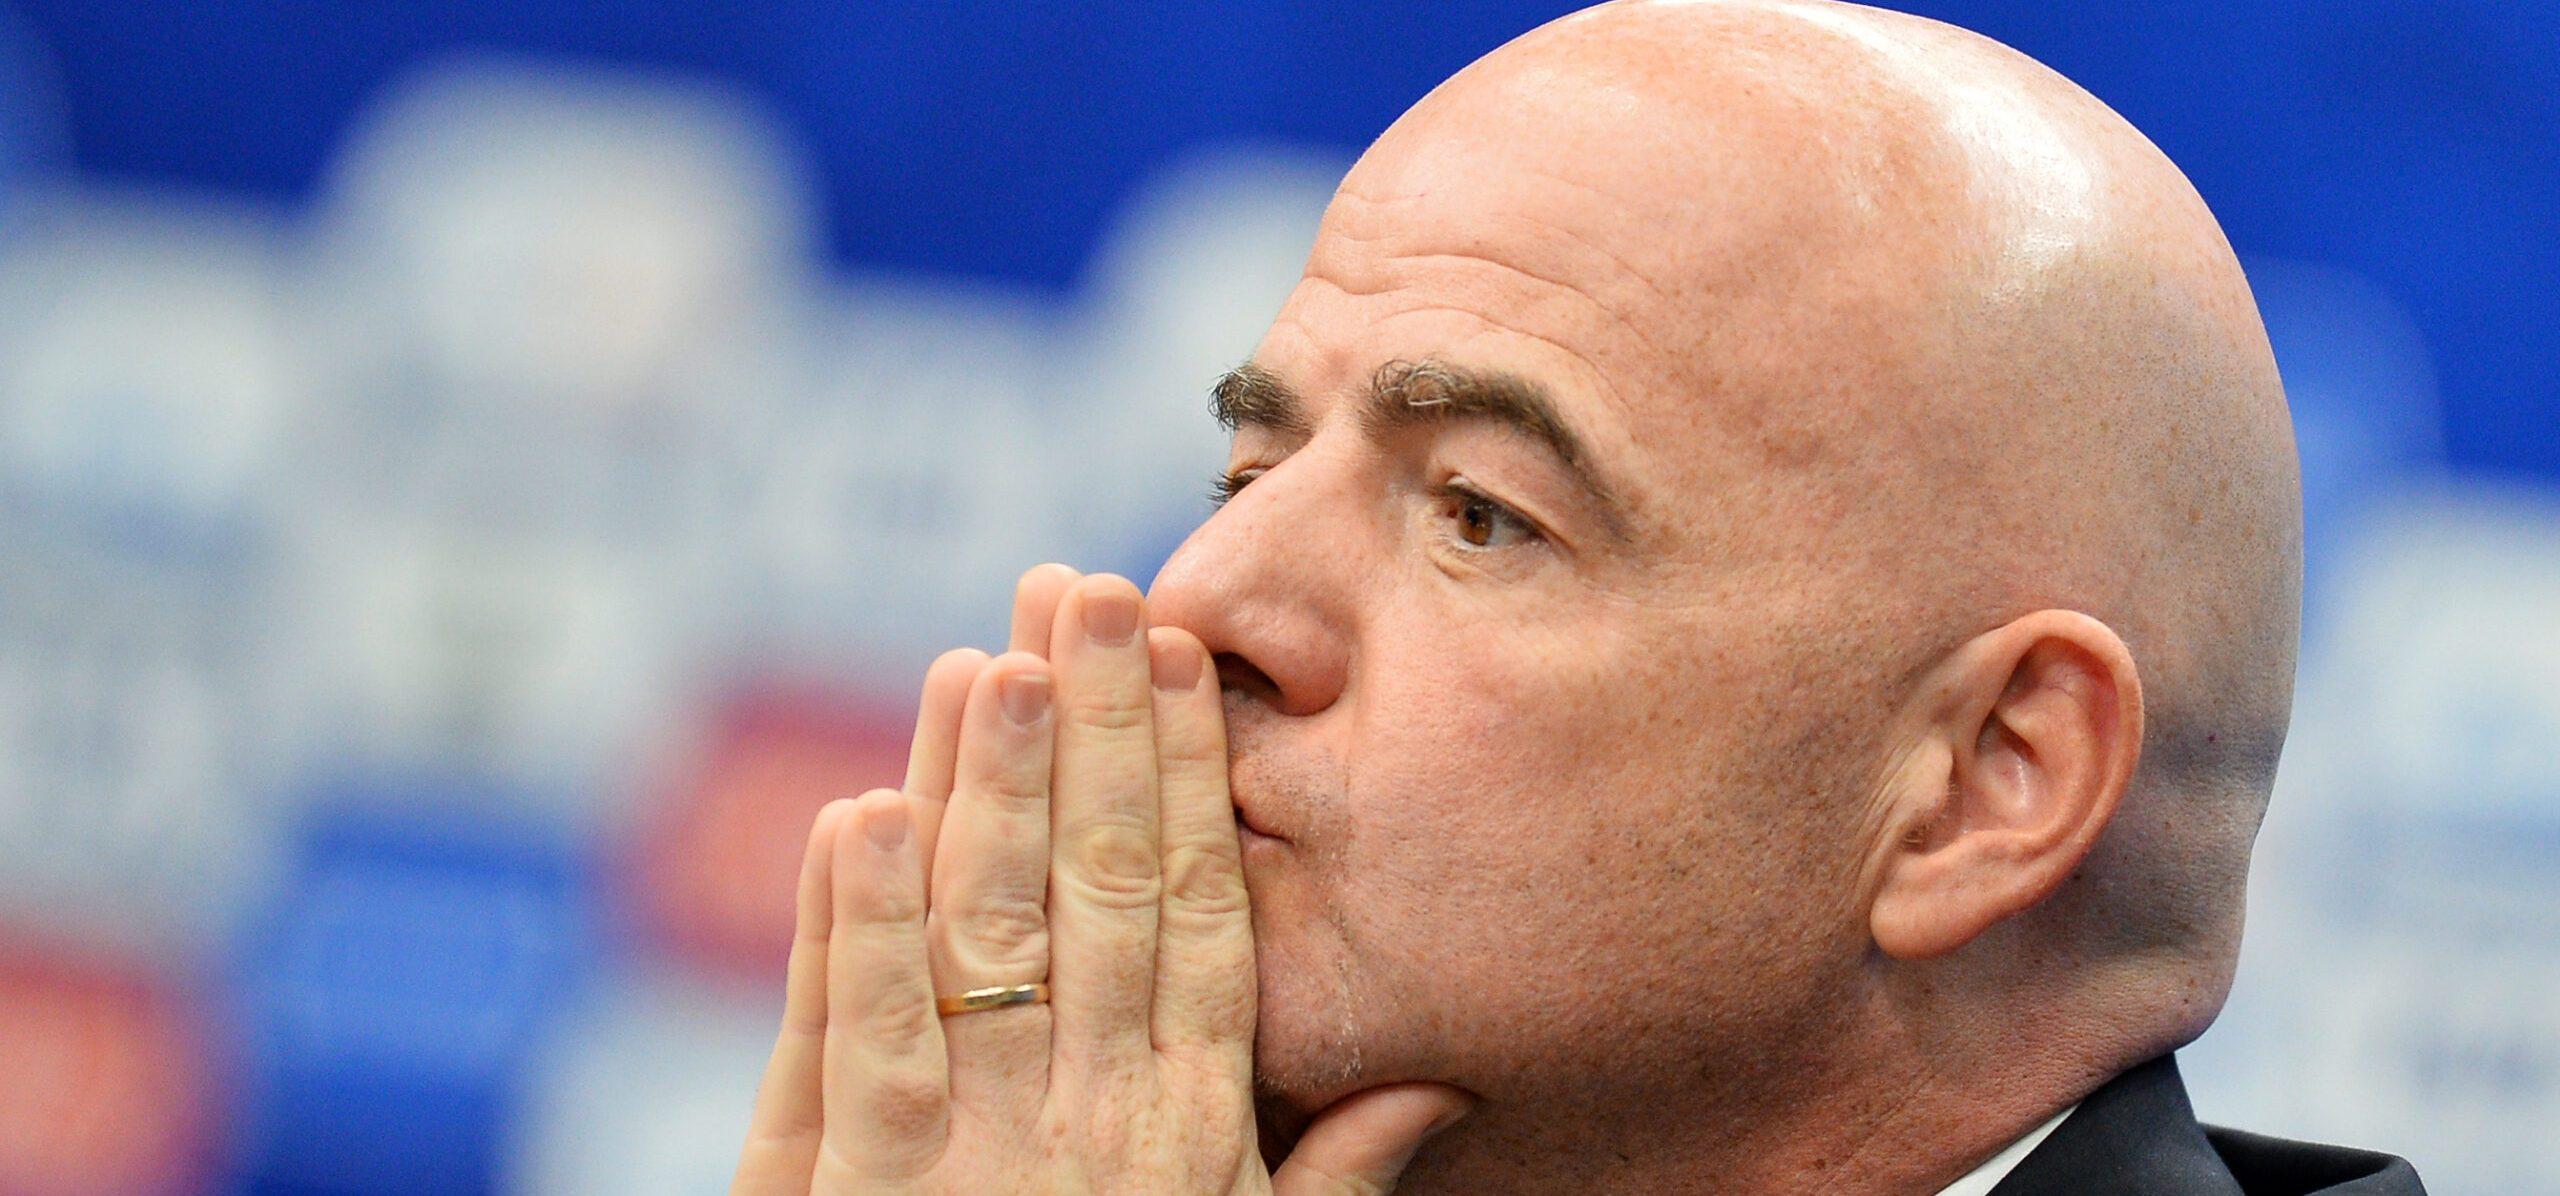 Fußball: Infantino in Erklärungsnot – Strafverfahren gegen FIFA-Boss